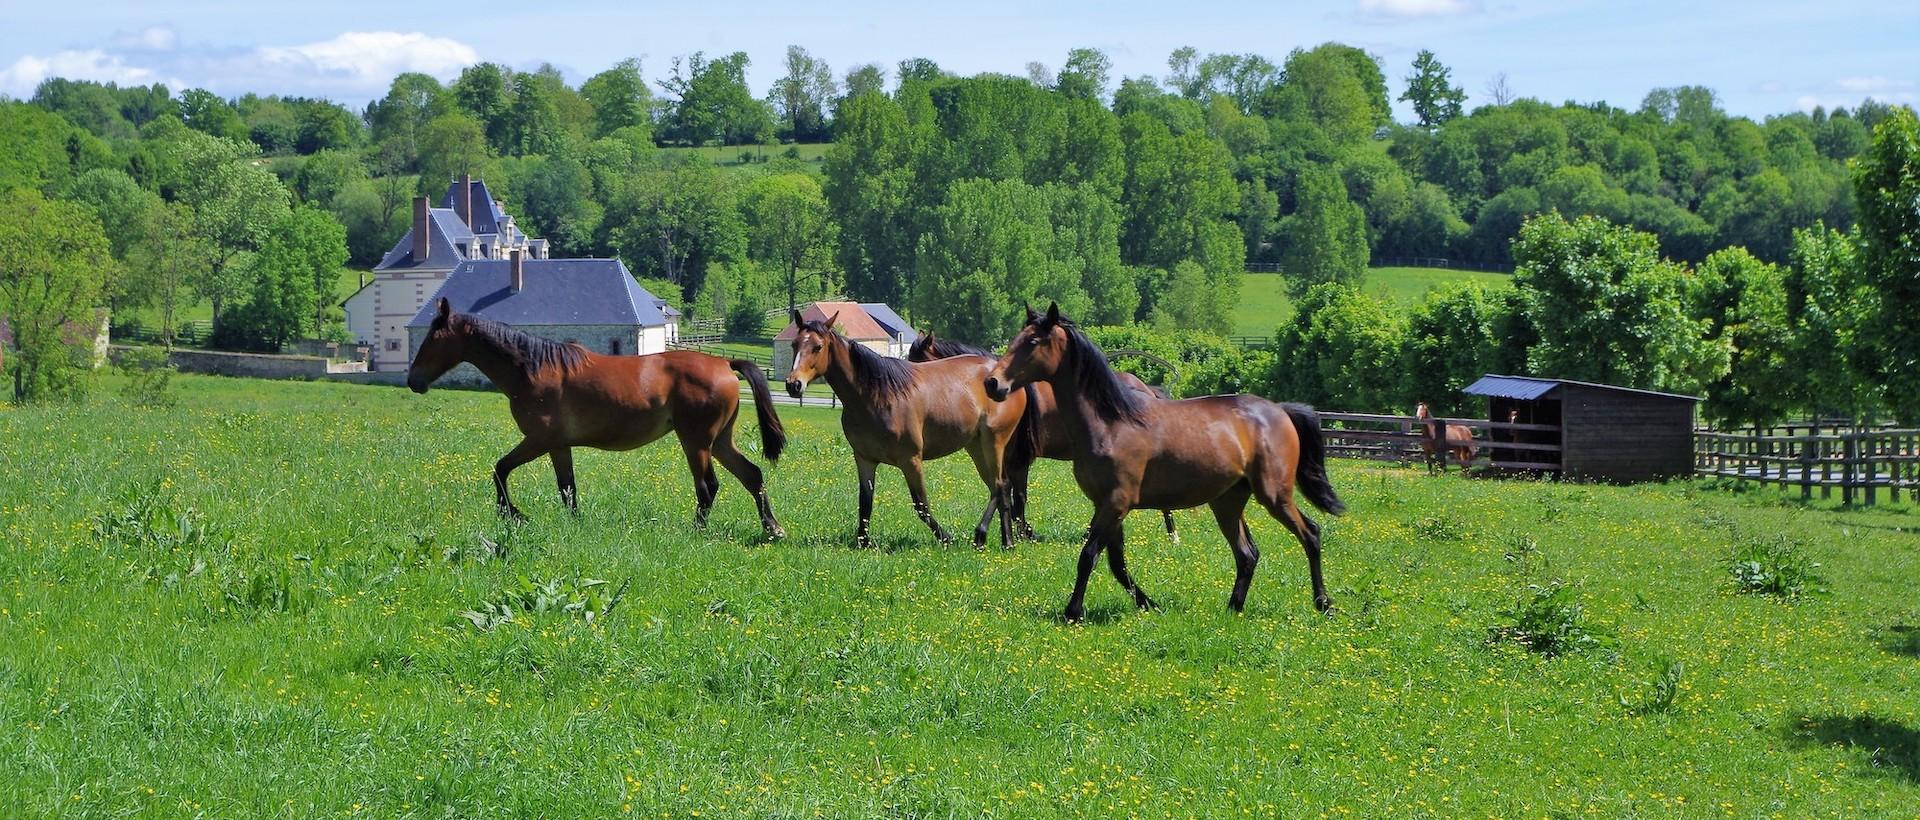 Le pays du Merlerault : Terre du cheval